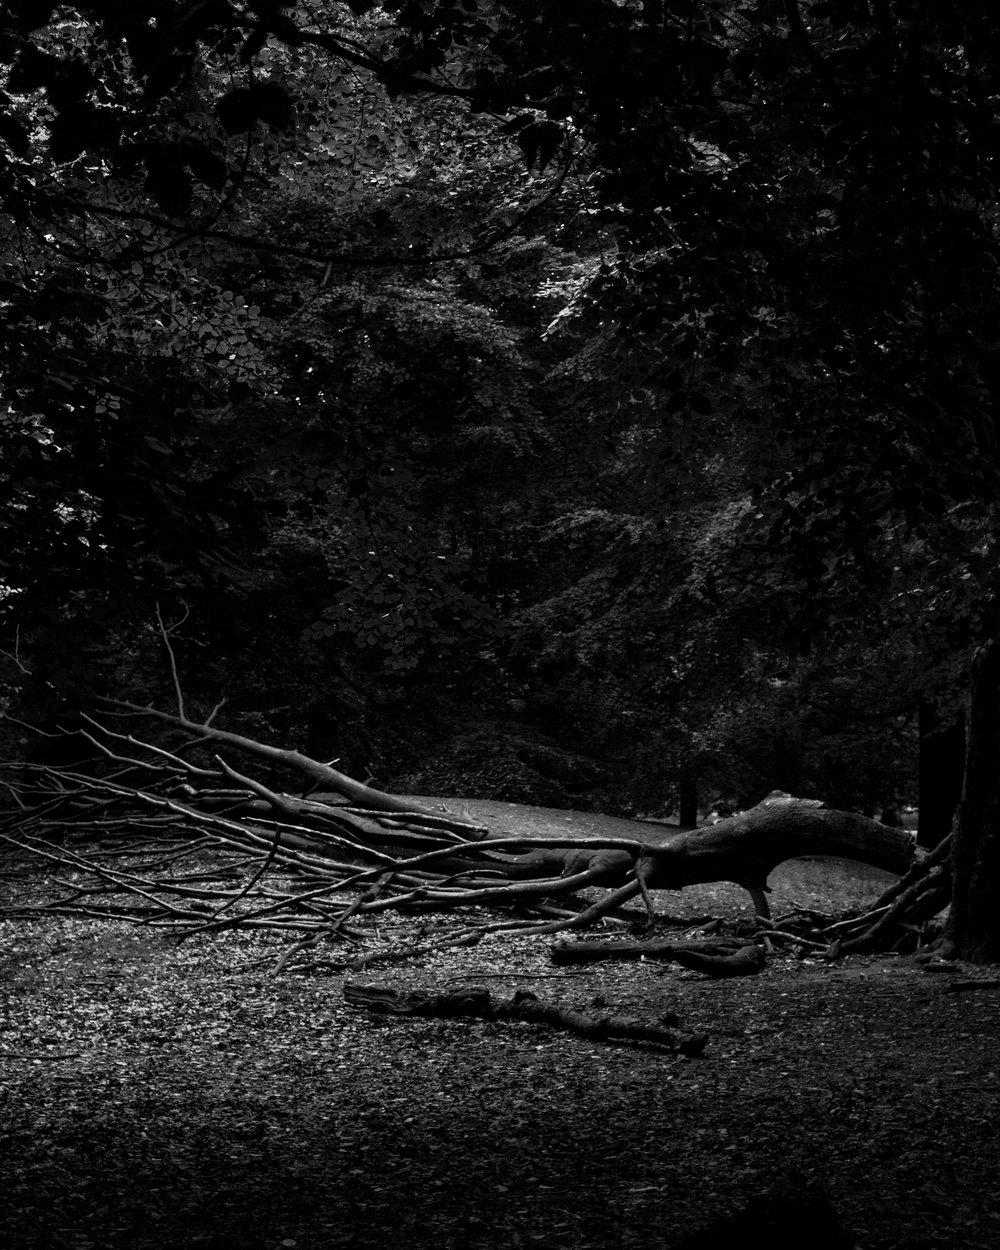 Tall as an Oak Tree_017.JPG